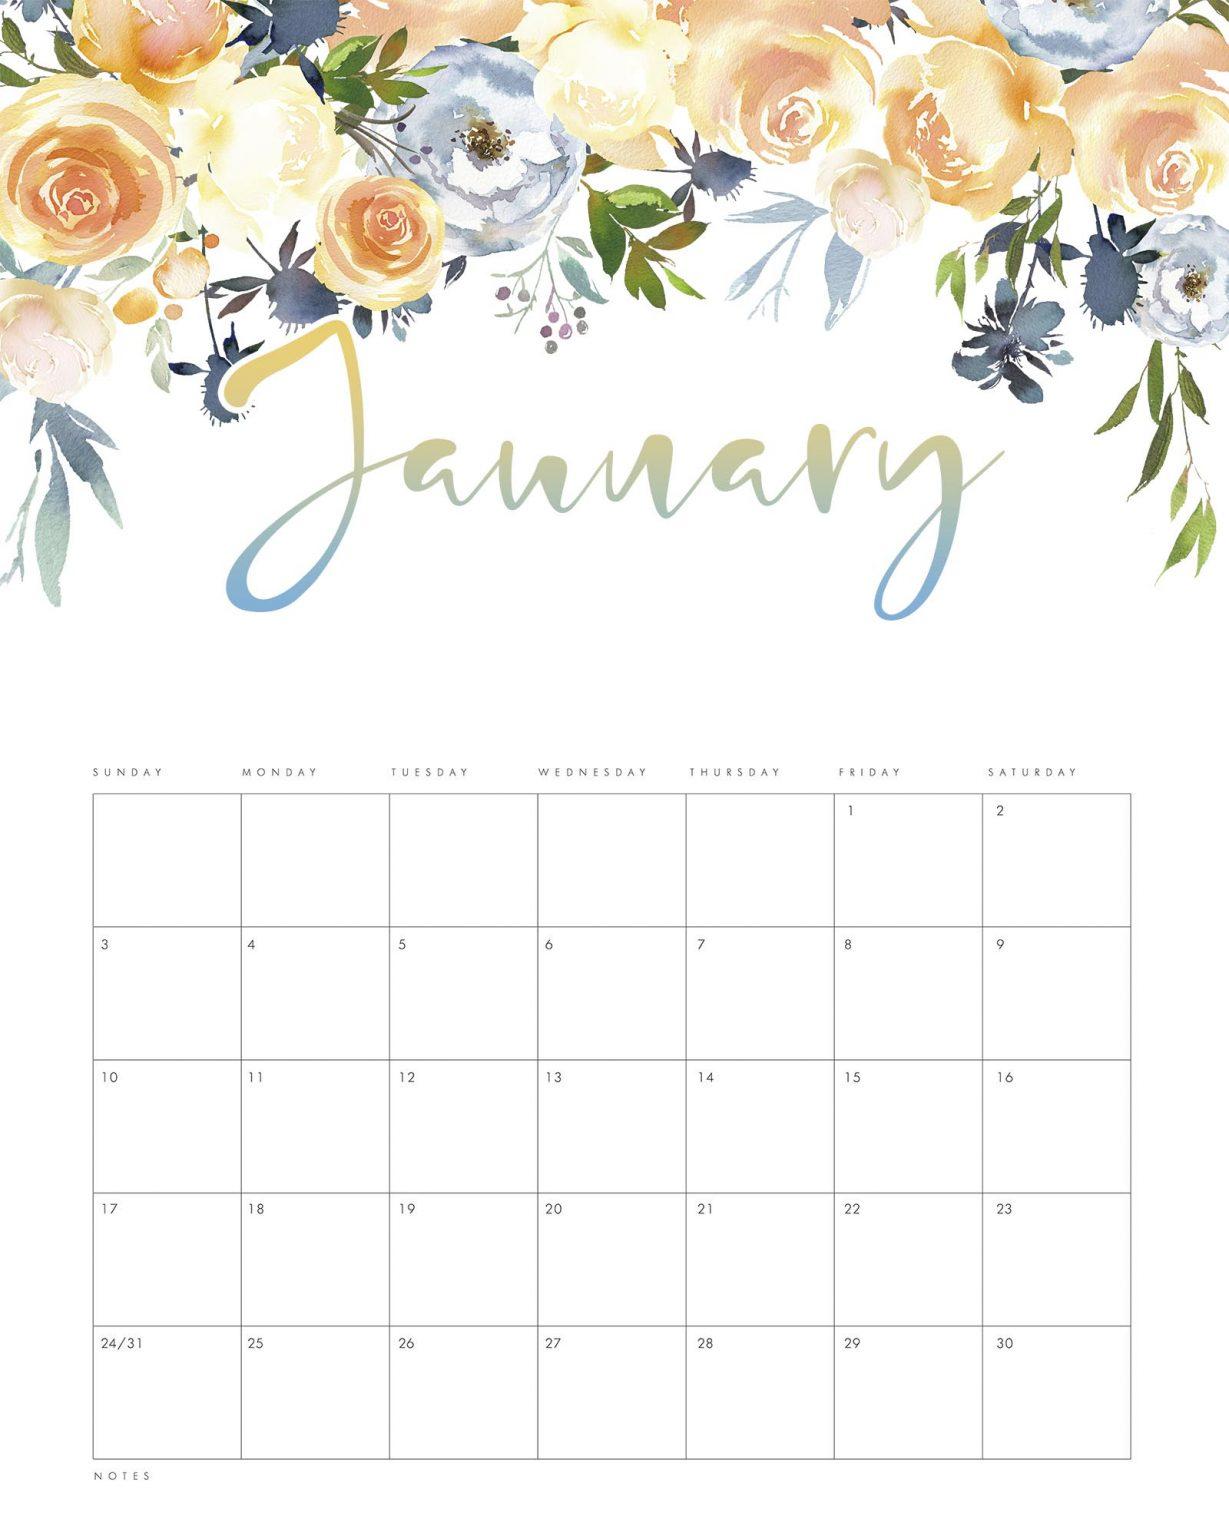 tcm-floraldrop-2021-calendar-1-1229x1536.jpg